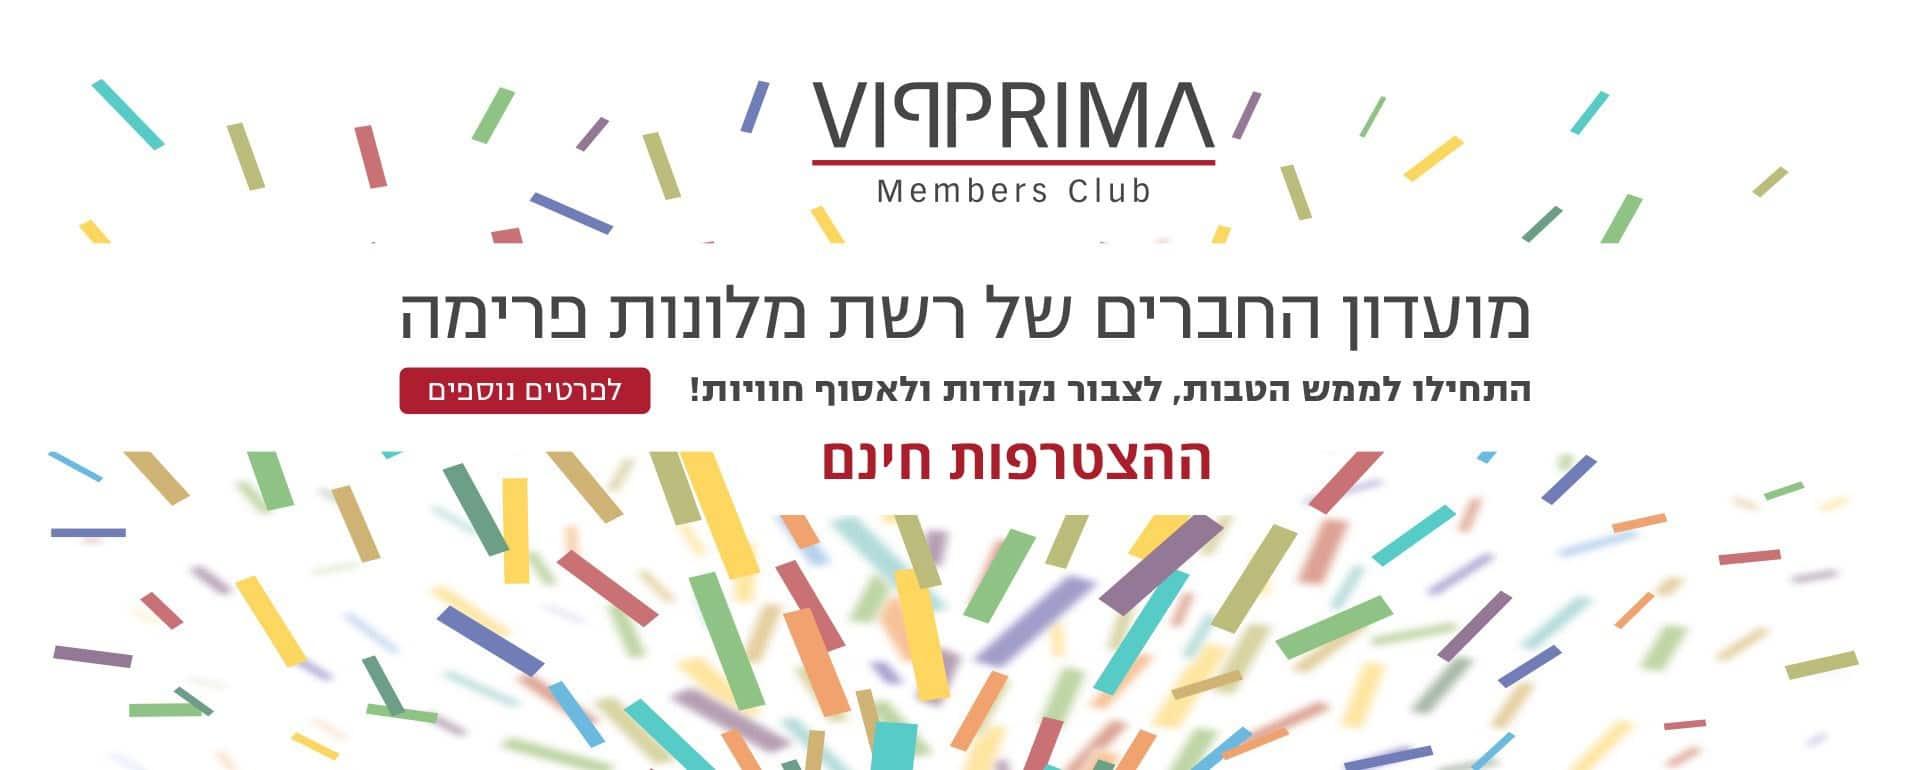 ViPrima - מועדון